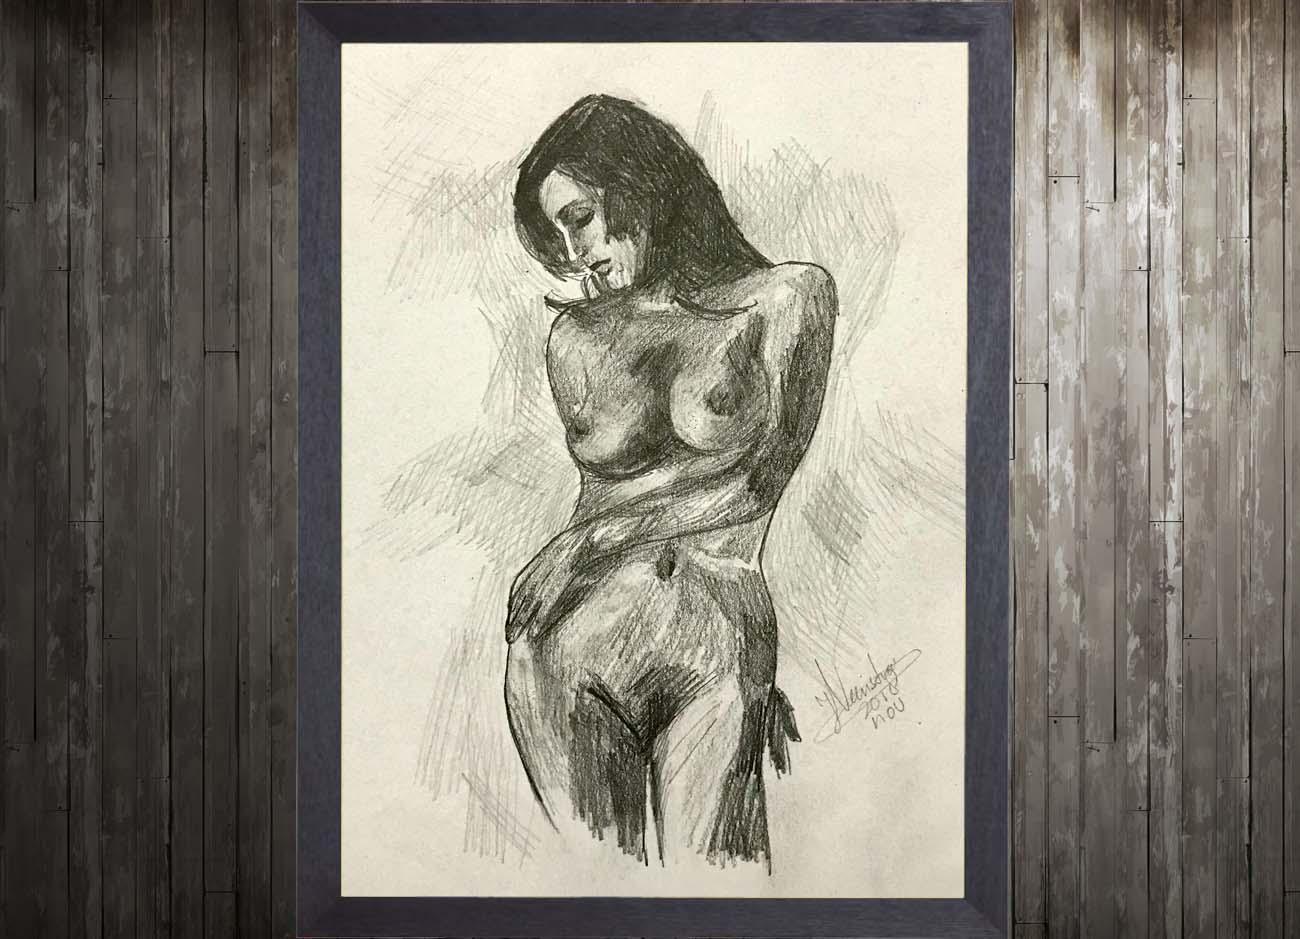 Jogchumskunst - Jogchum Veenstra Kunst - Potlood tekening vrouw